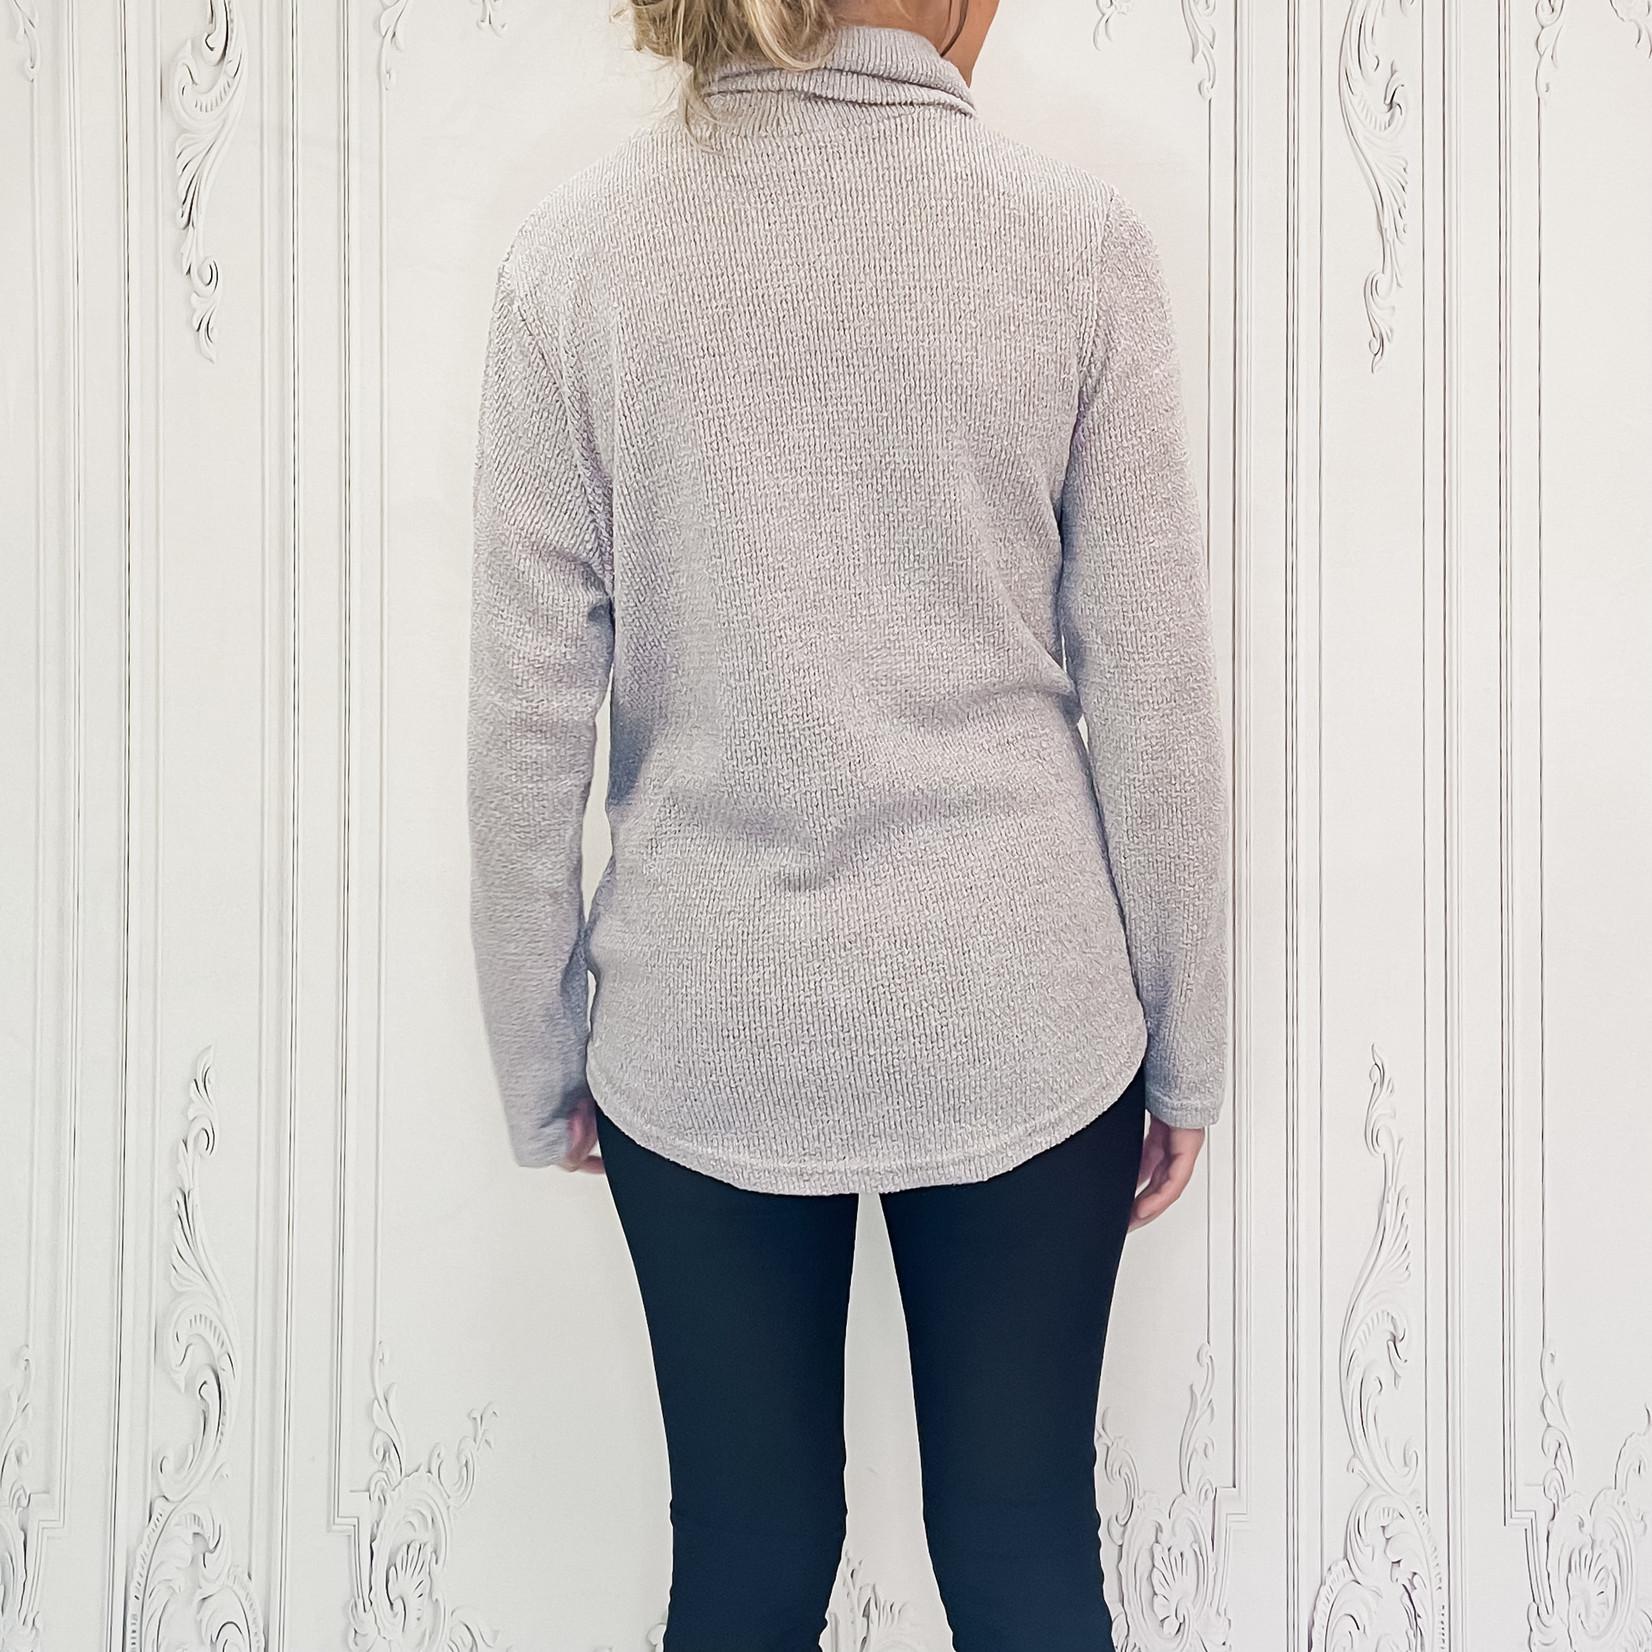 Sam knot turtle neck sweater